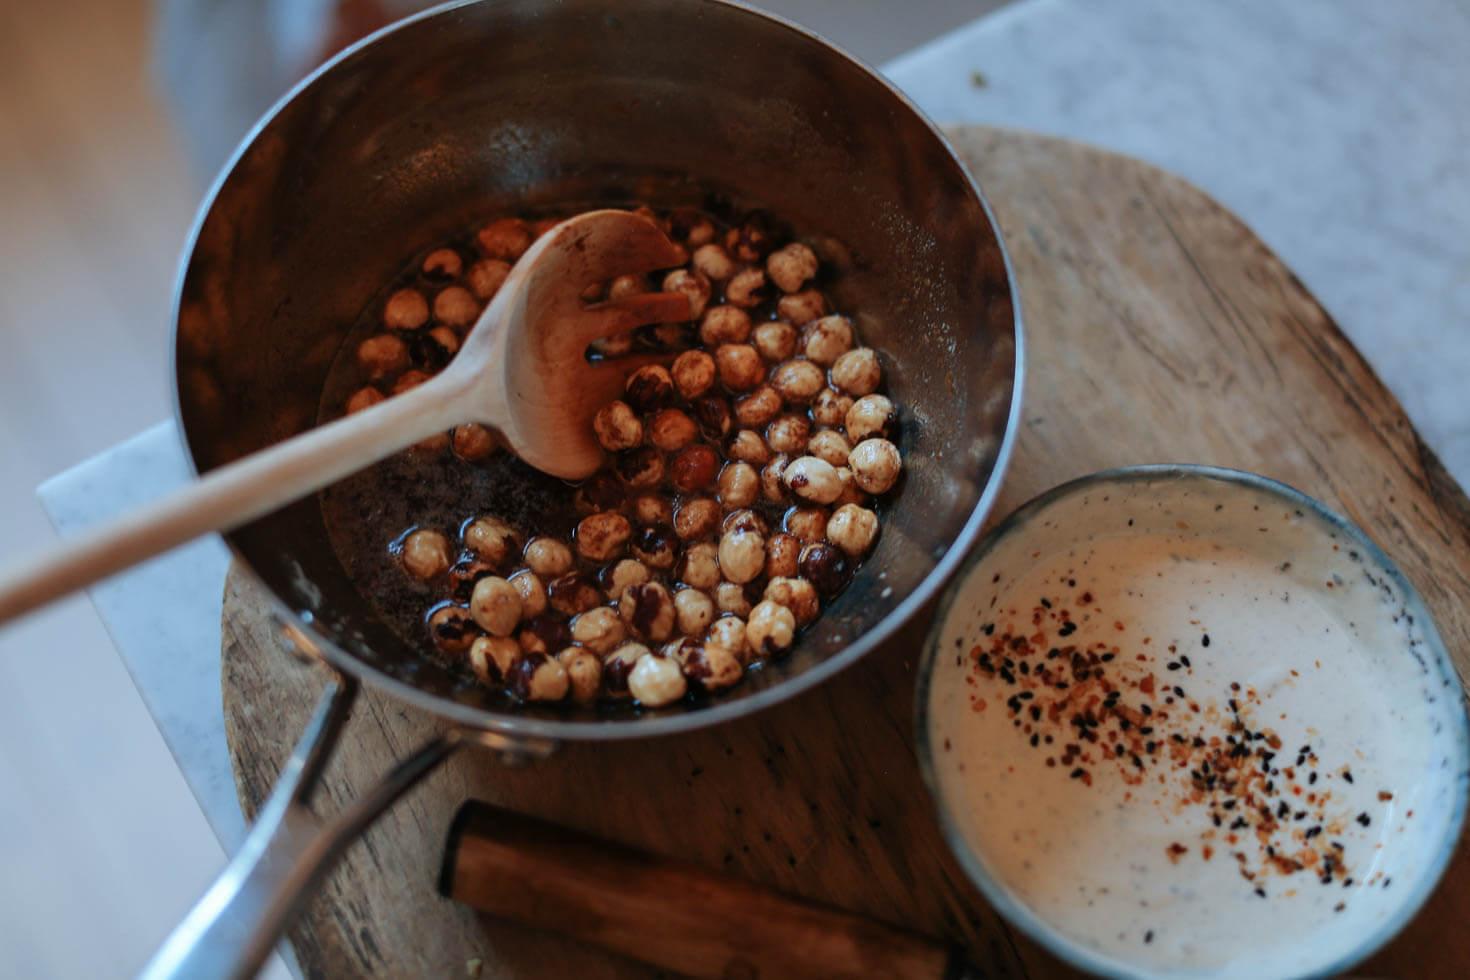 Spetskal i ugn med brynt smor och rostade hasselnotter-4